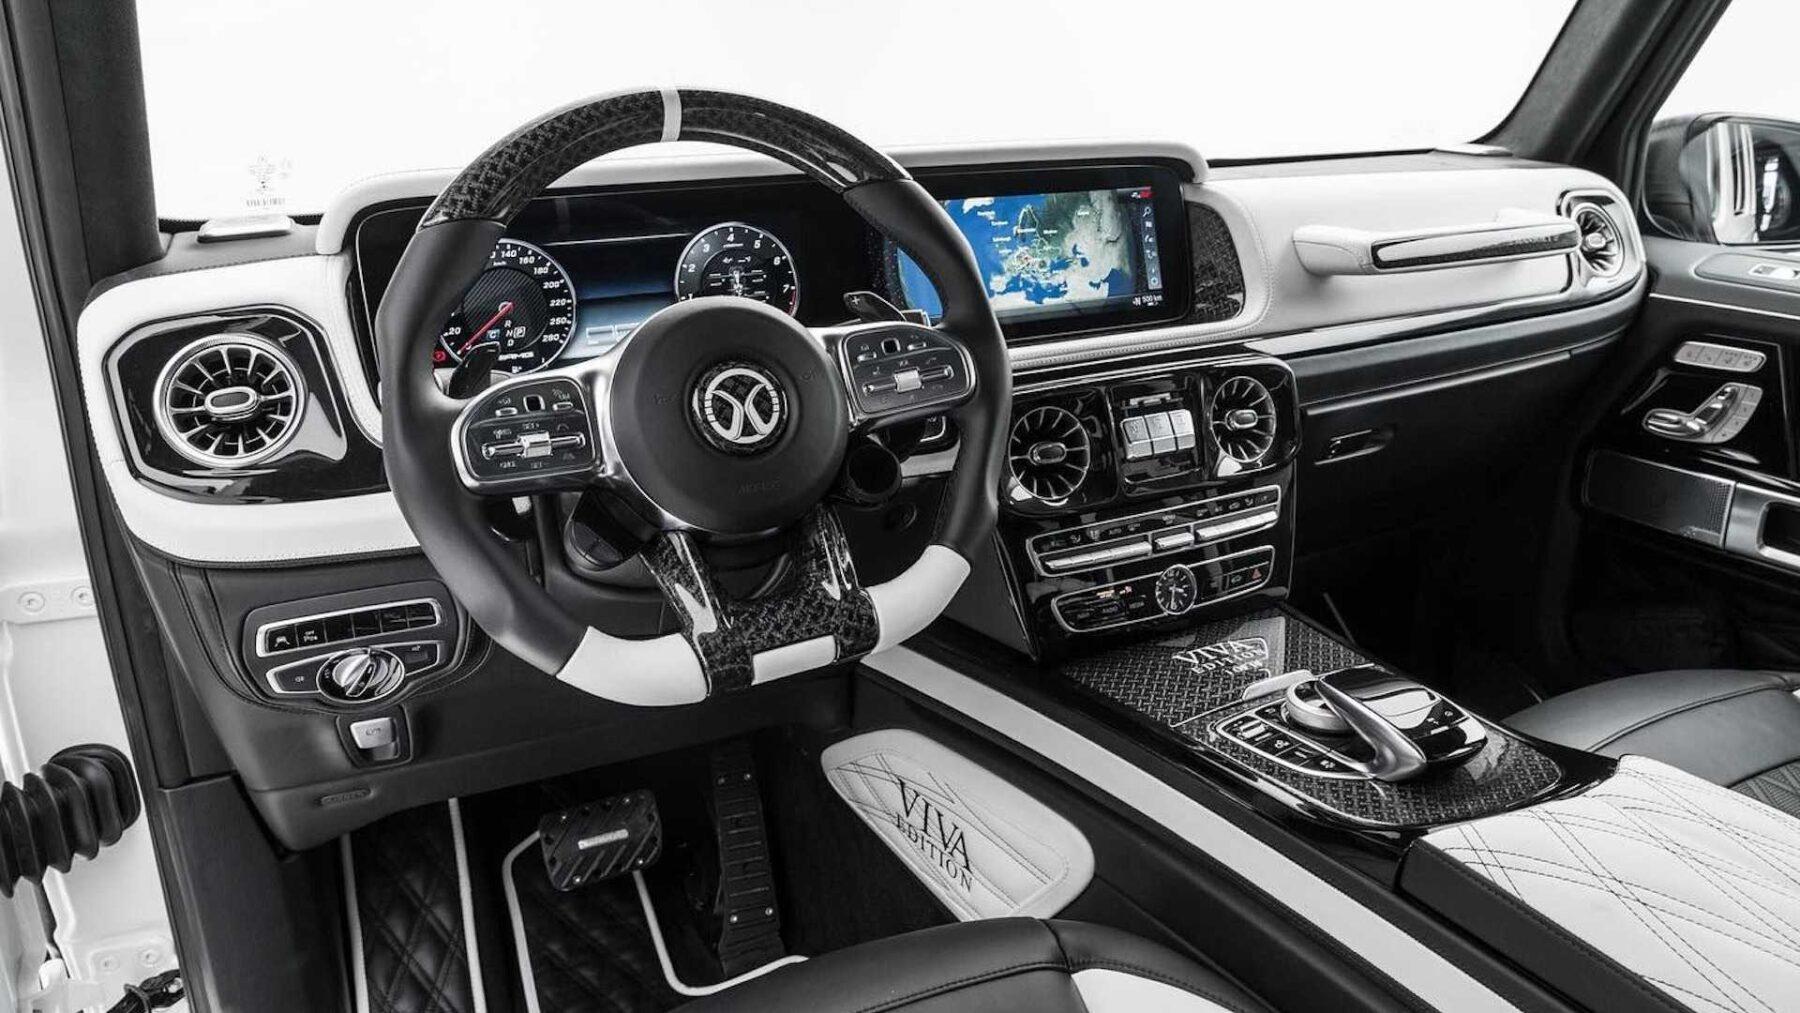 Interior Mansory AMG G63 Viva Edition